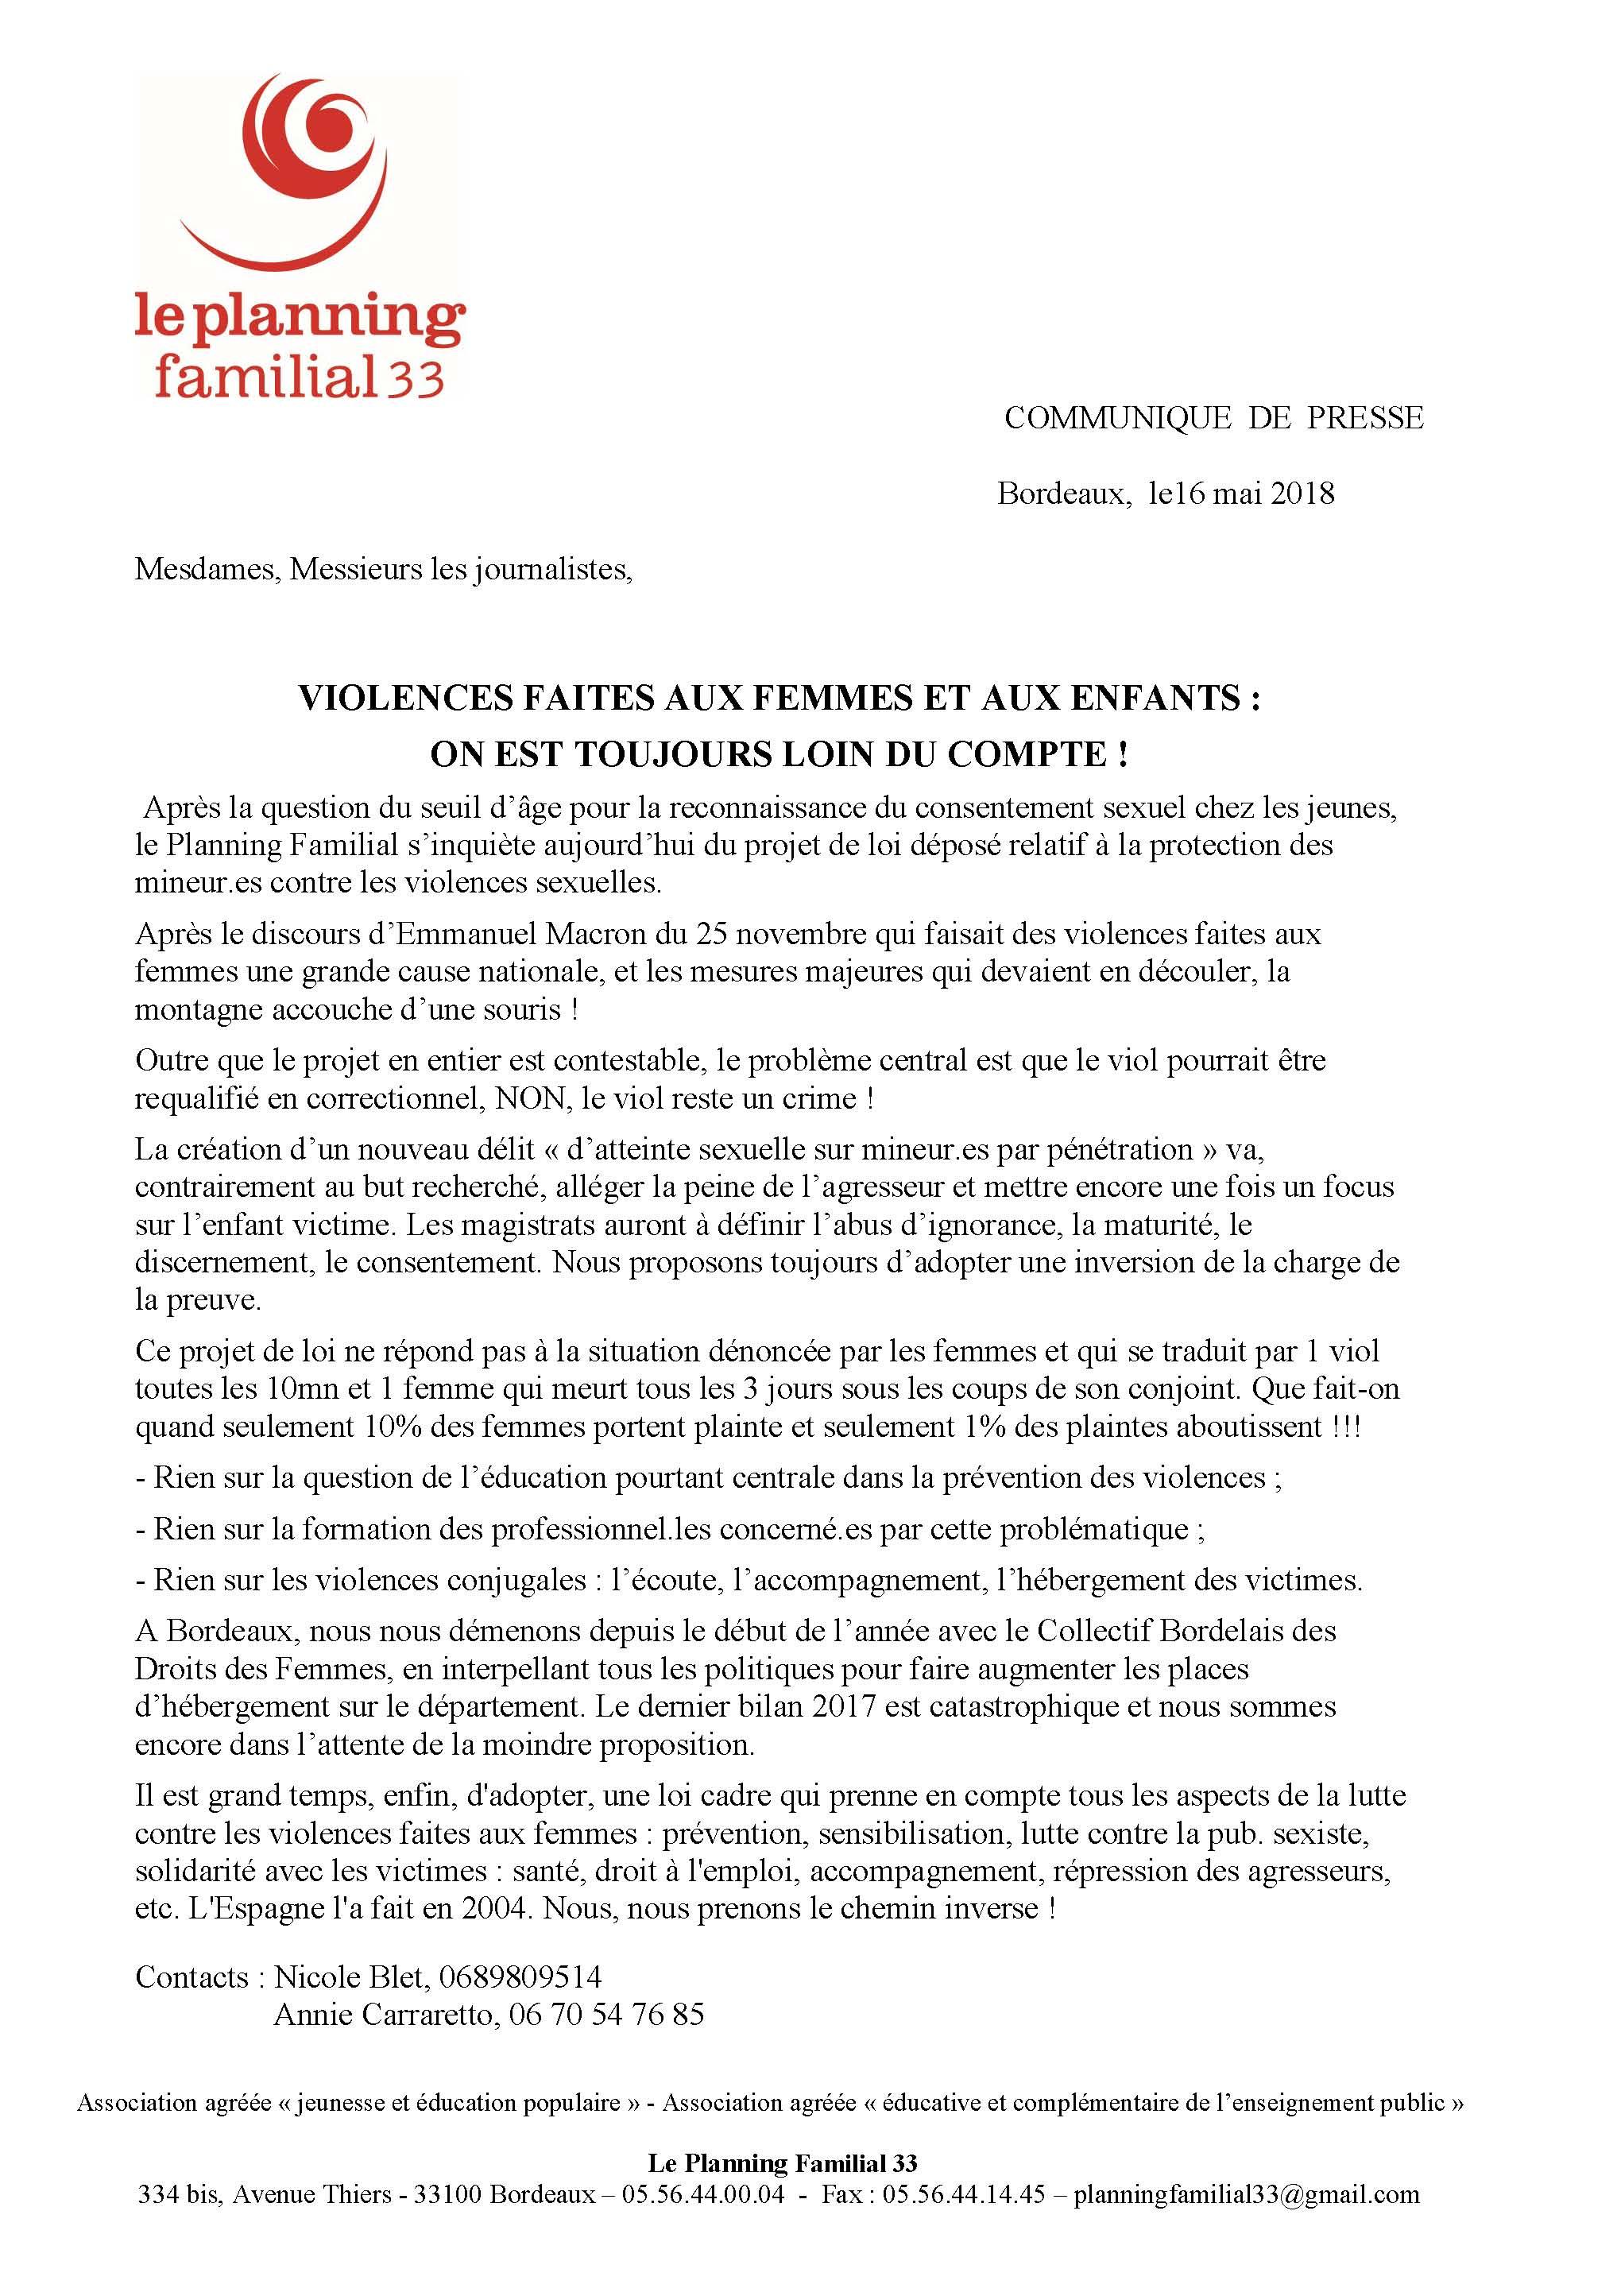 cp-violences-mai-18-jpeg